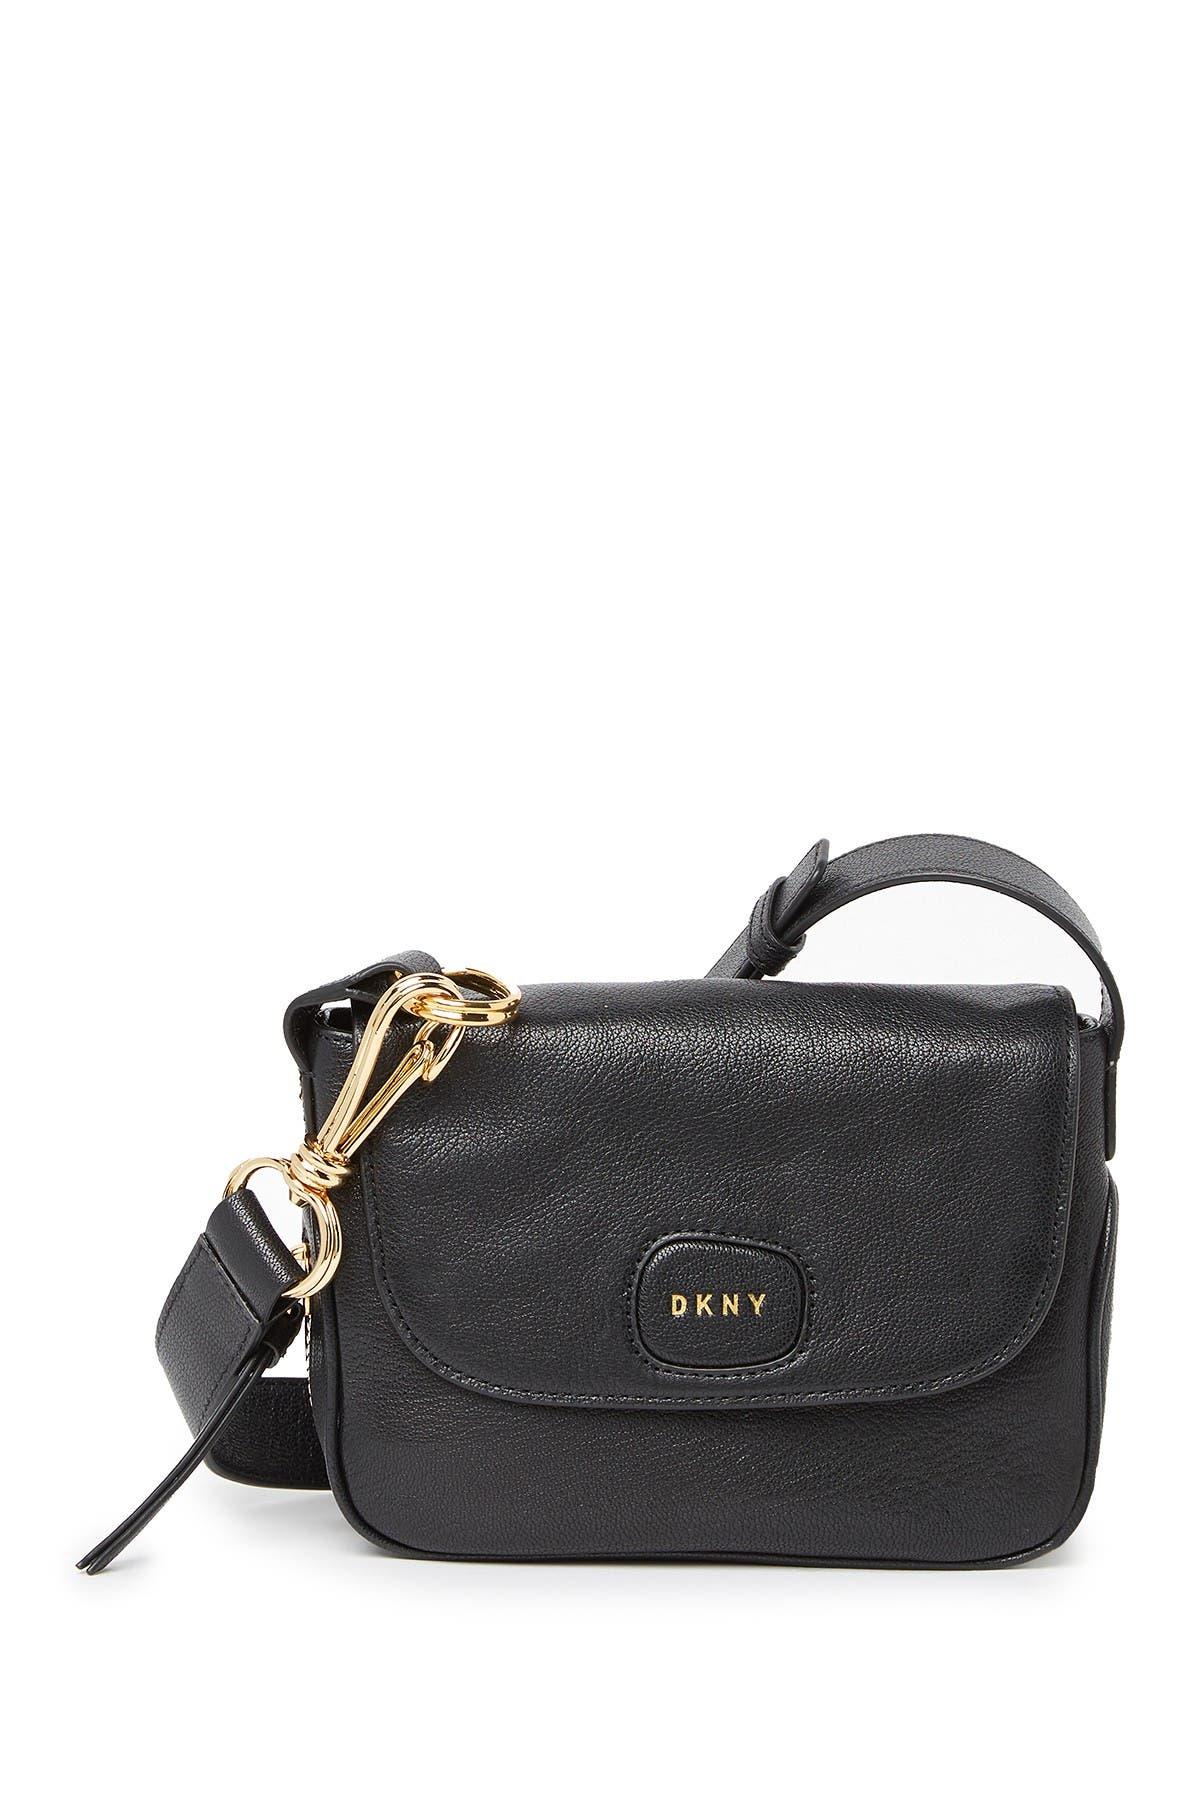 Image of DKNY Randall Small Leather Crossbody Bag